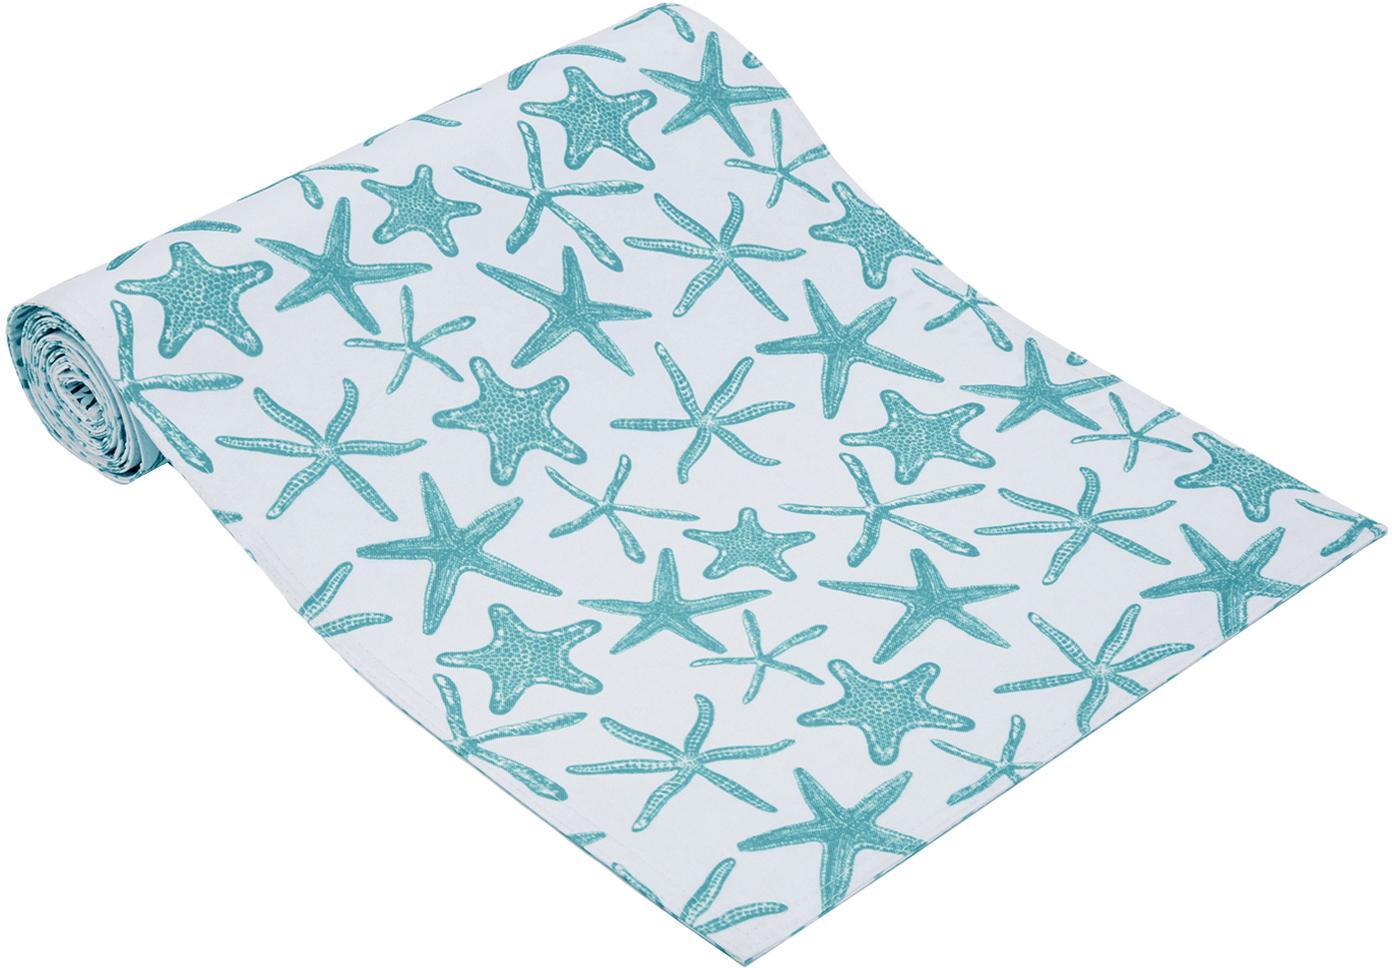 Camino de mesa impermeable Starbone, reversible, Poliéster, Blanco, azul, An 33 x L 178 cm